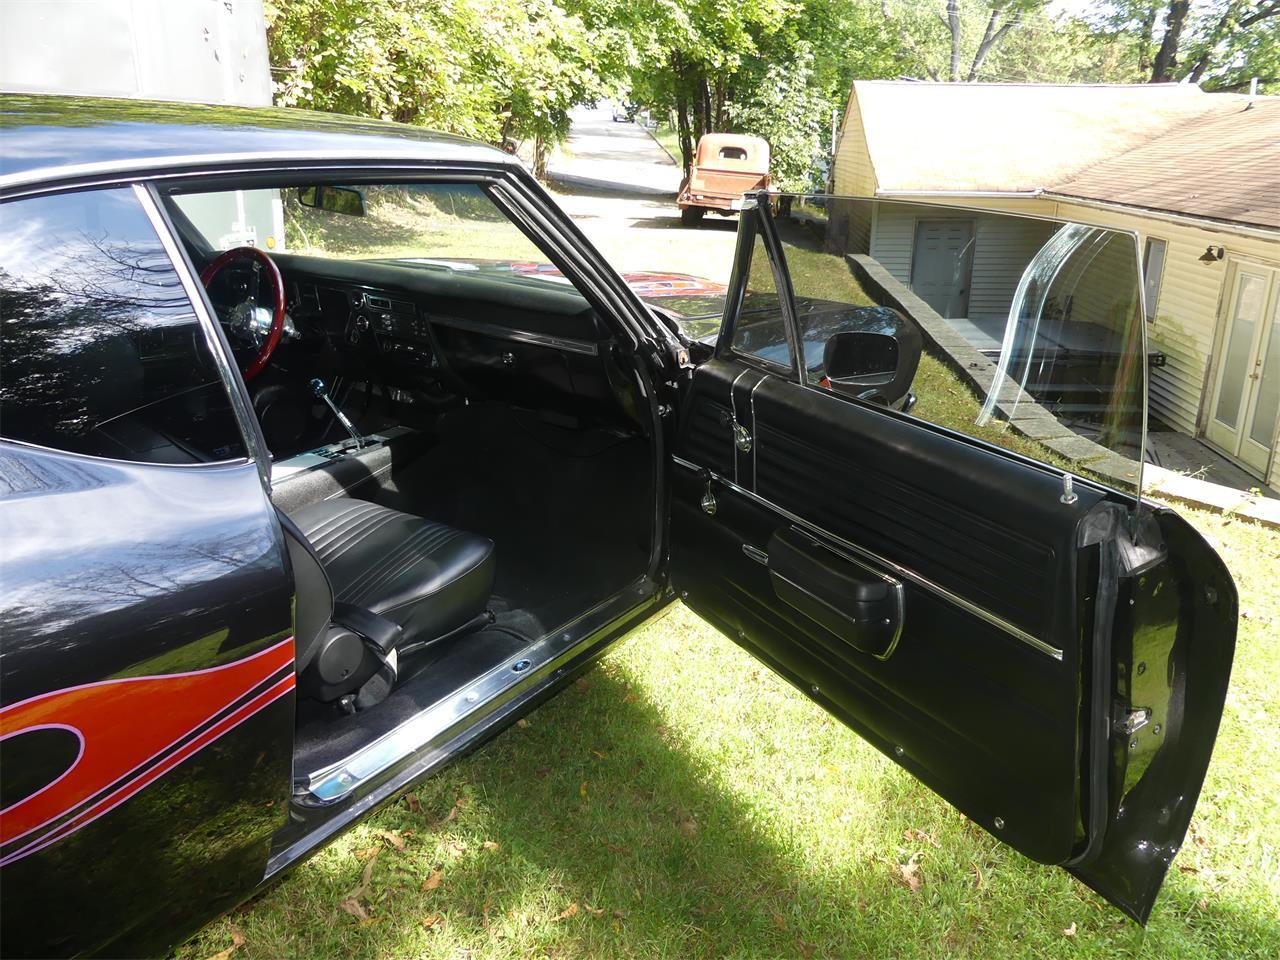 1968 Chevrolet Chevelle Malibu (CC-1270198) for sale in Rockaway, New Jersey